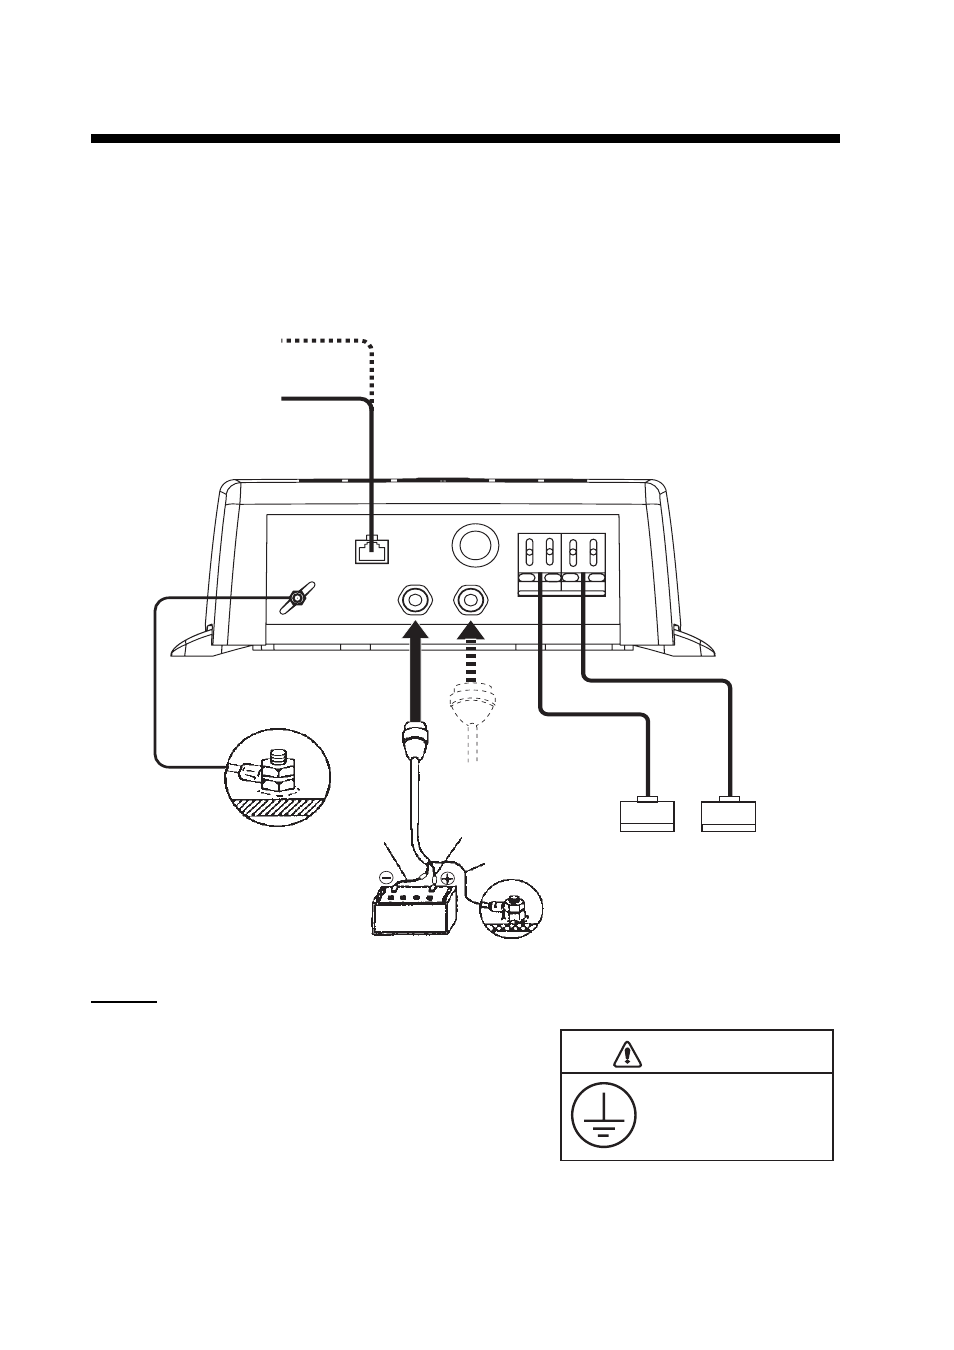 wrg 4500 furuno wiring diagram rh 76 nano fm nl furuno 585 wiring diagram furuno radar wiring diagram